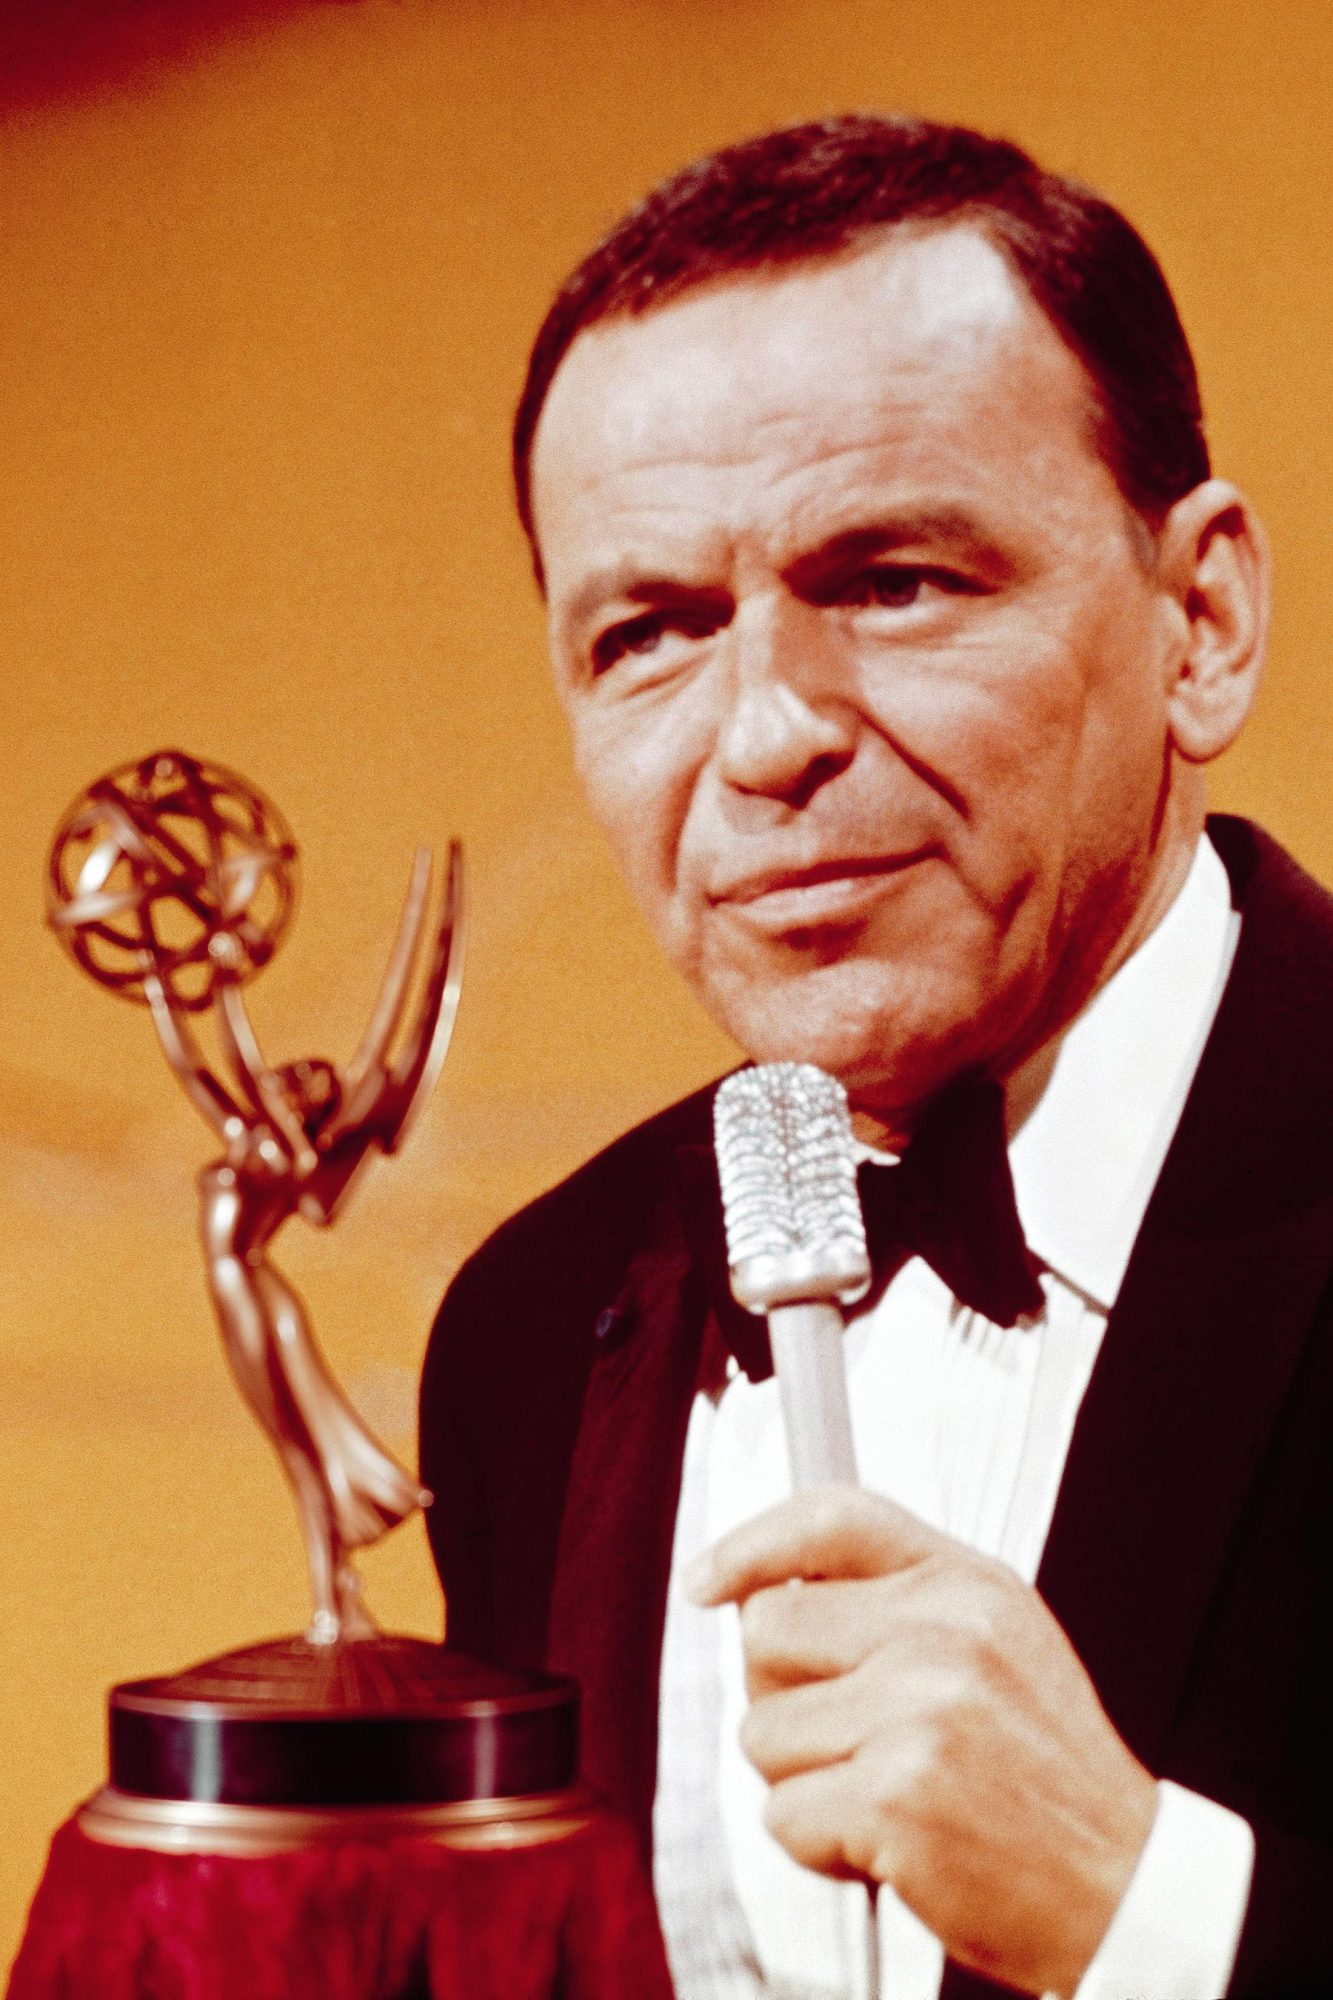 20th Annual Primetime Emmy Awards